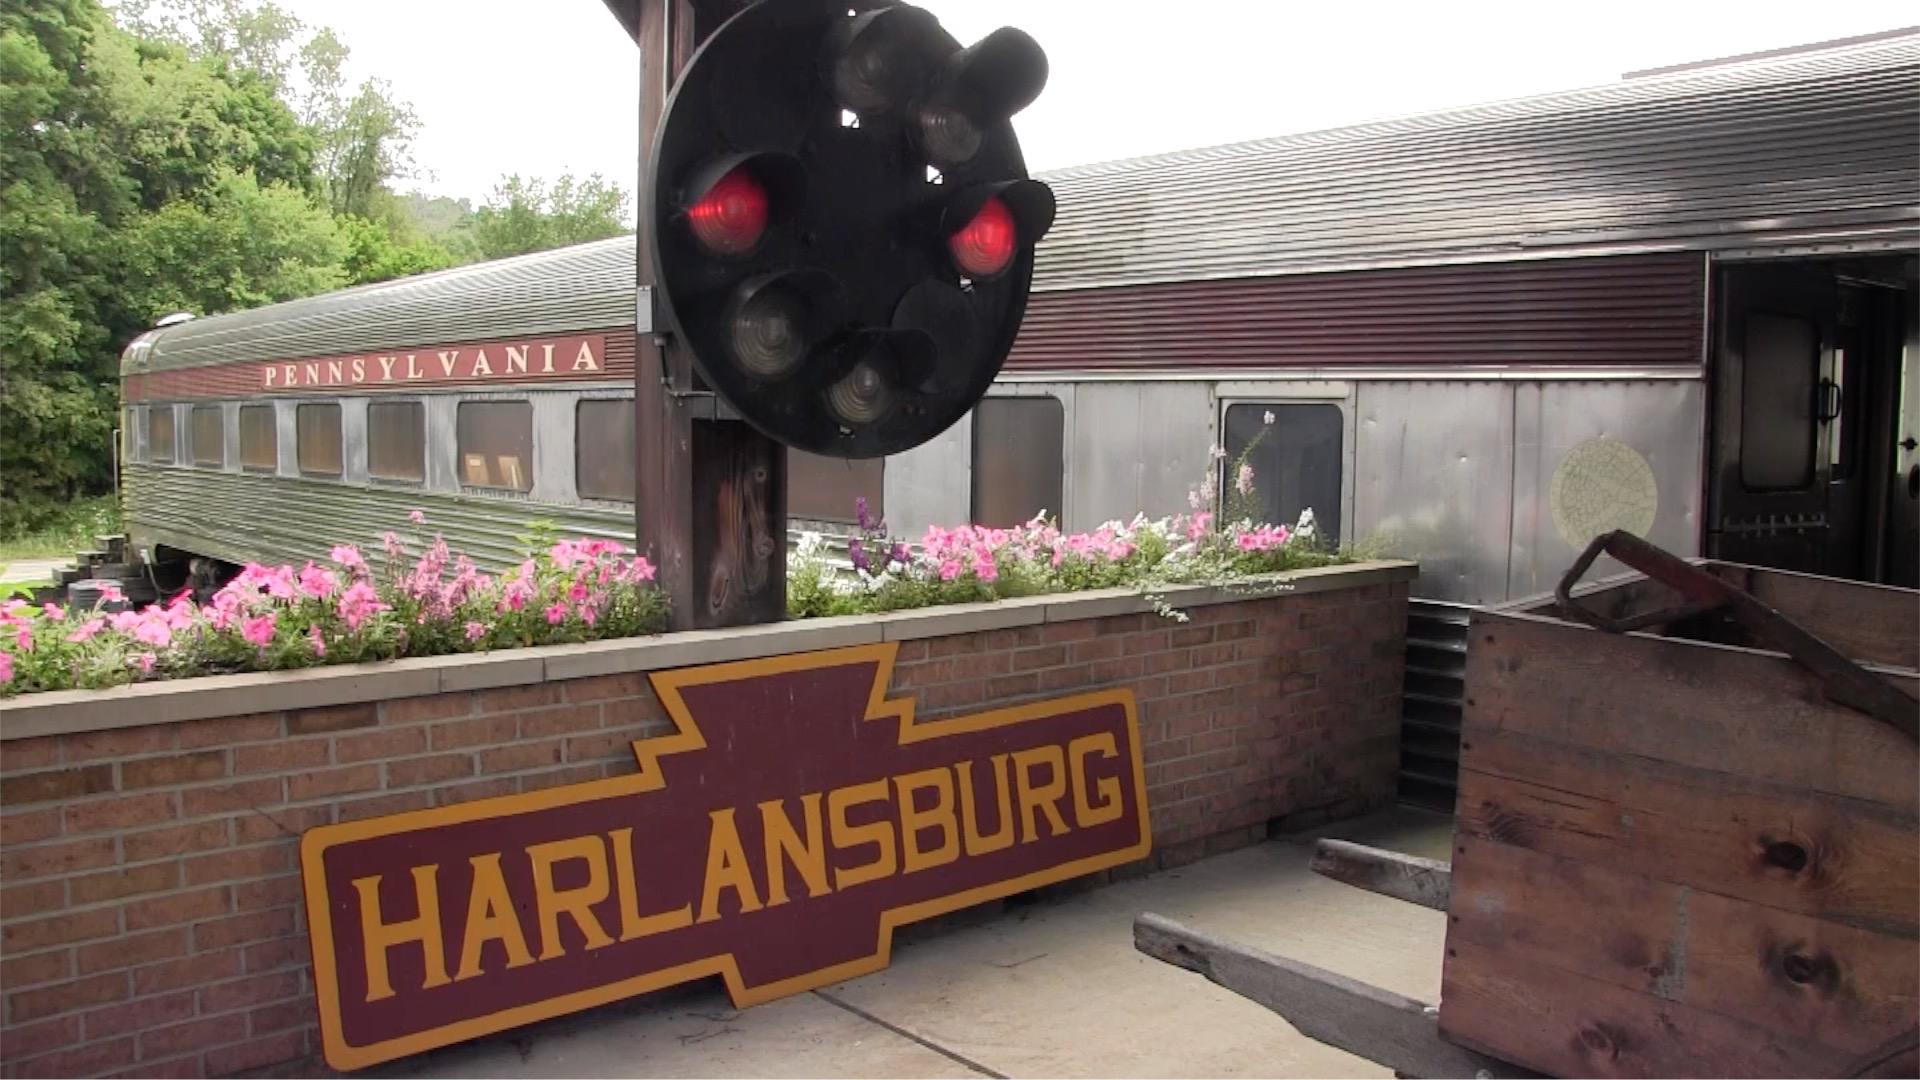 harlansburg station New Castle